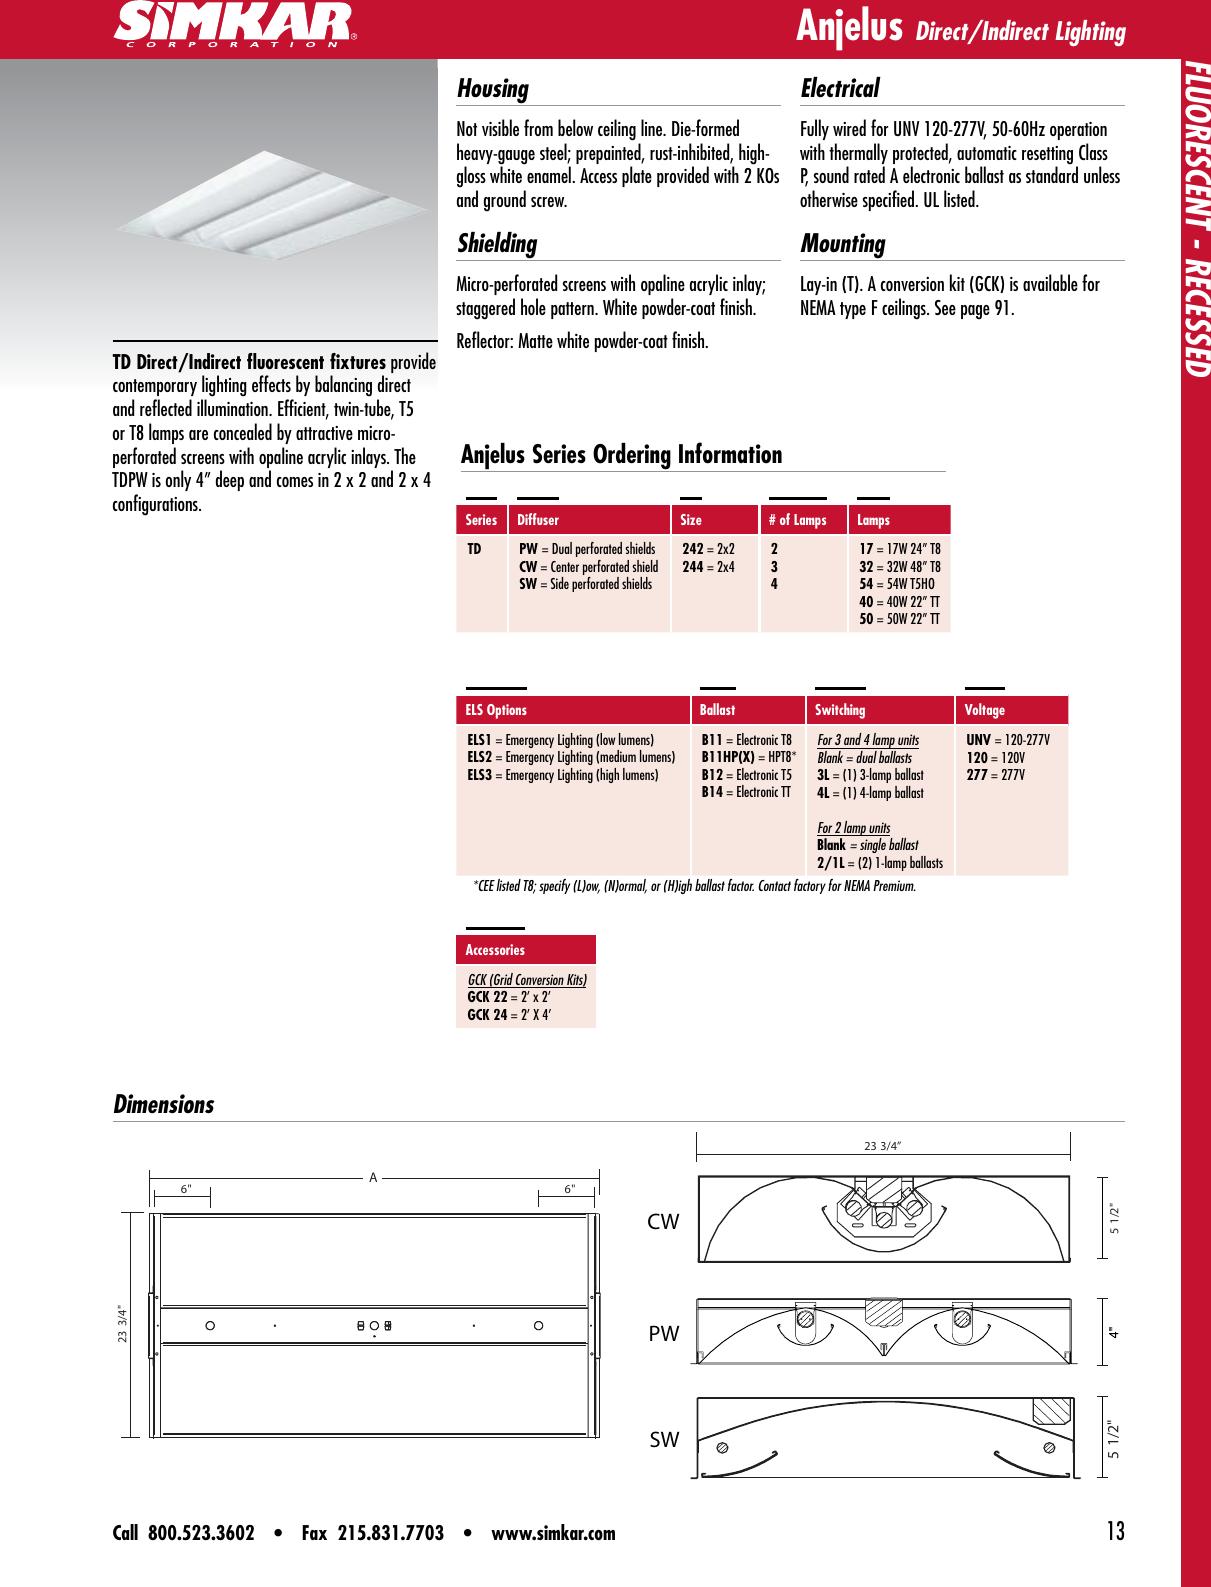 Economy Min Bulbs 1 Max Bulbs 2 Primary Lamp Type F32 Wiring Method on